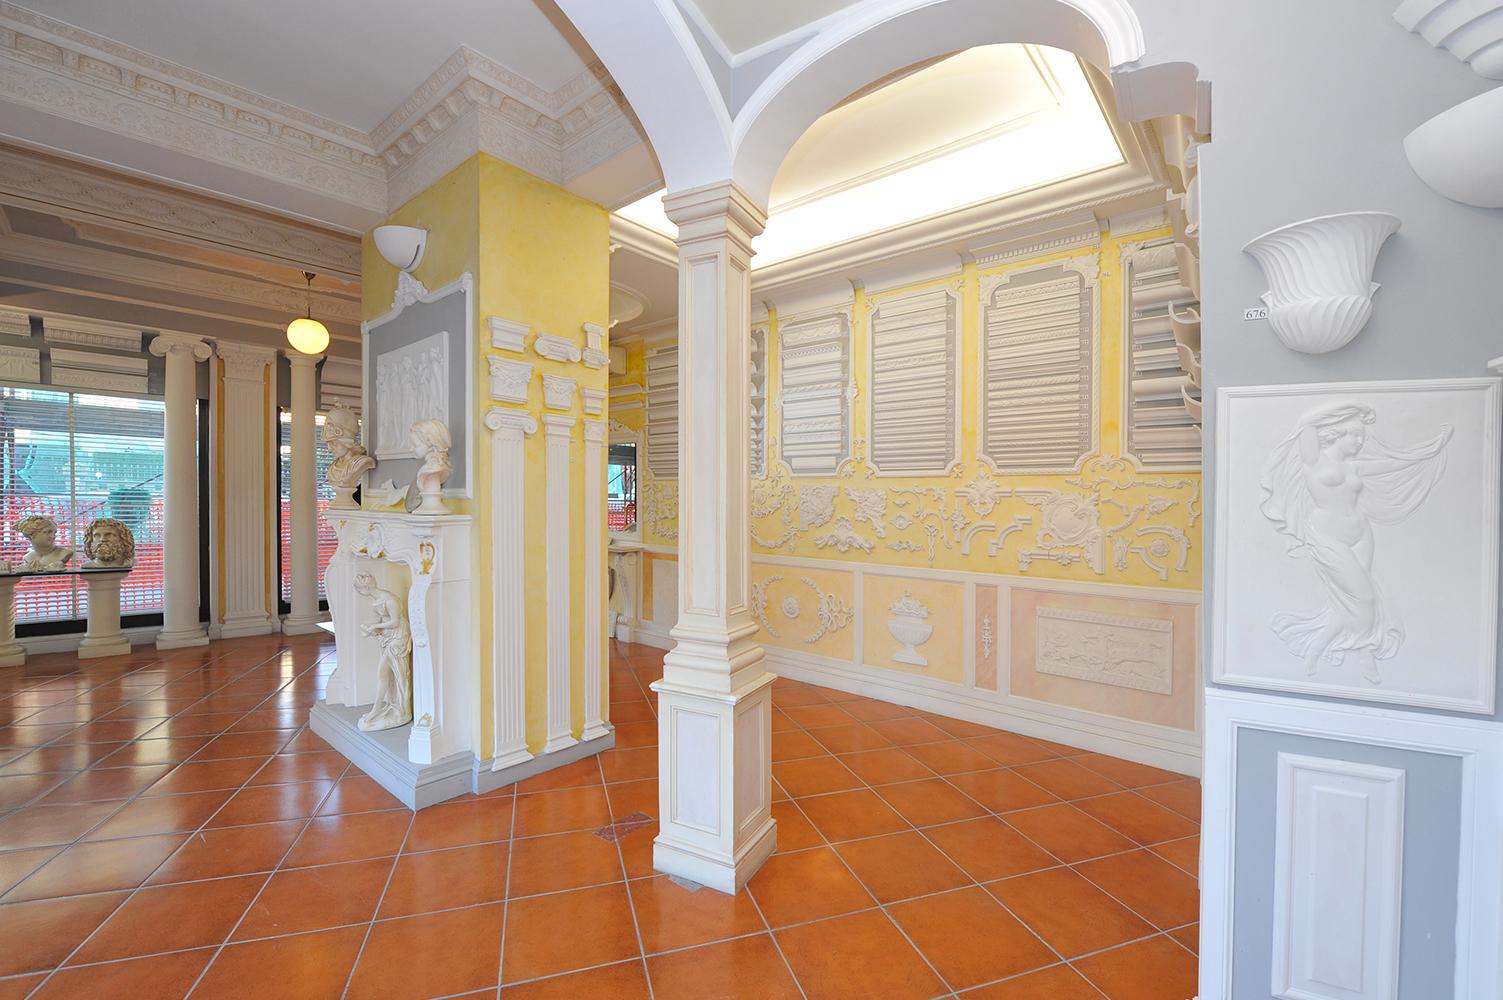 Ribichini Stucchi  Produzione stucchi decorativi a Roma